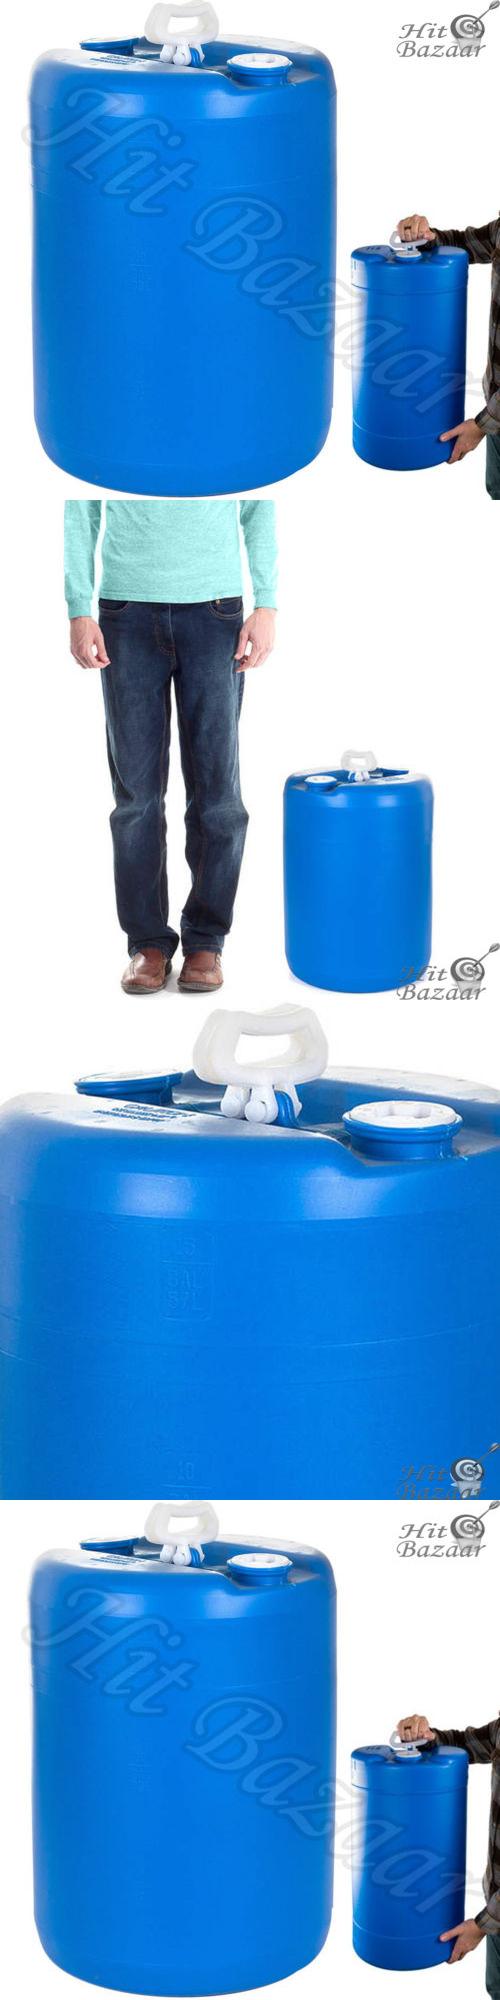 water storage and rain barrels emergency water storage barrel 15 gallon portable survival household - Water Storage Barrels